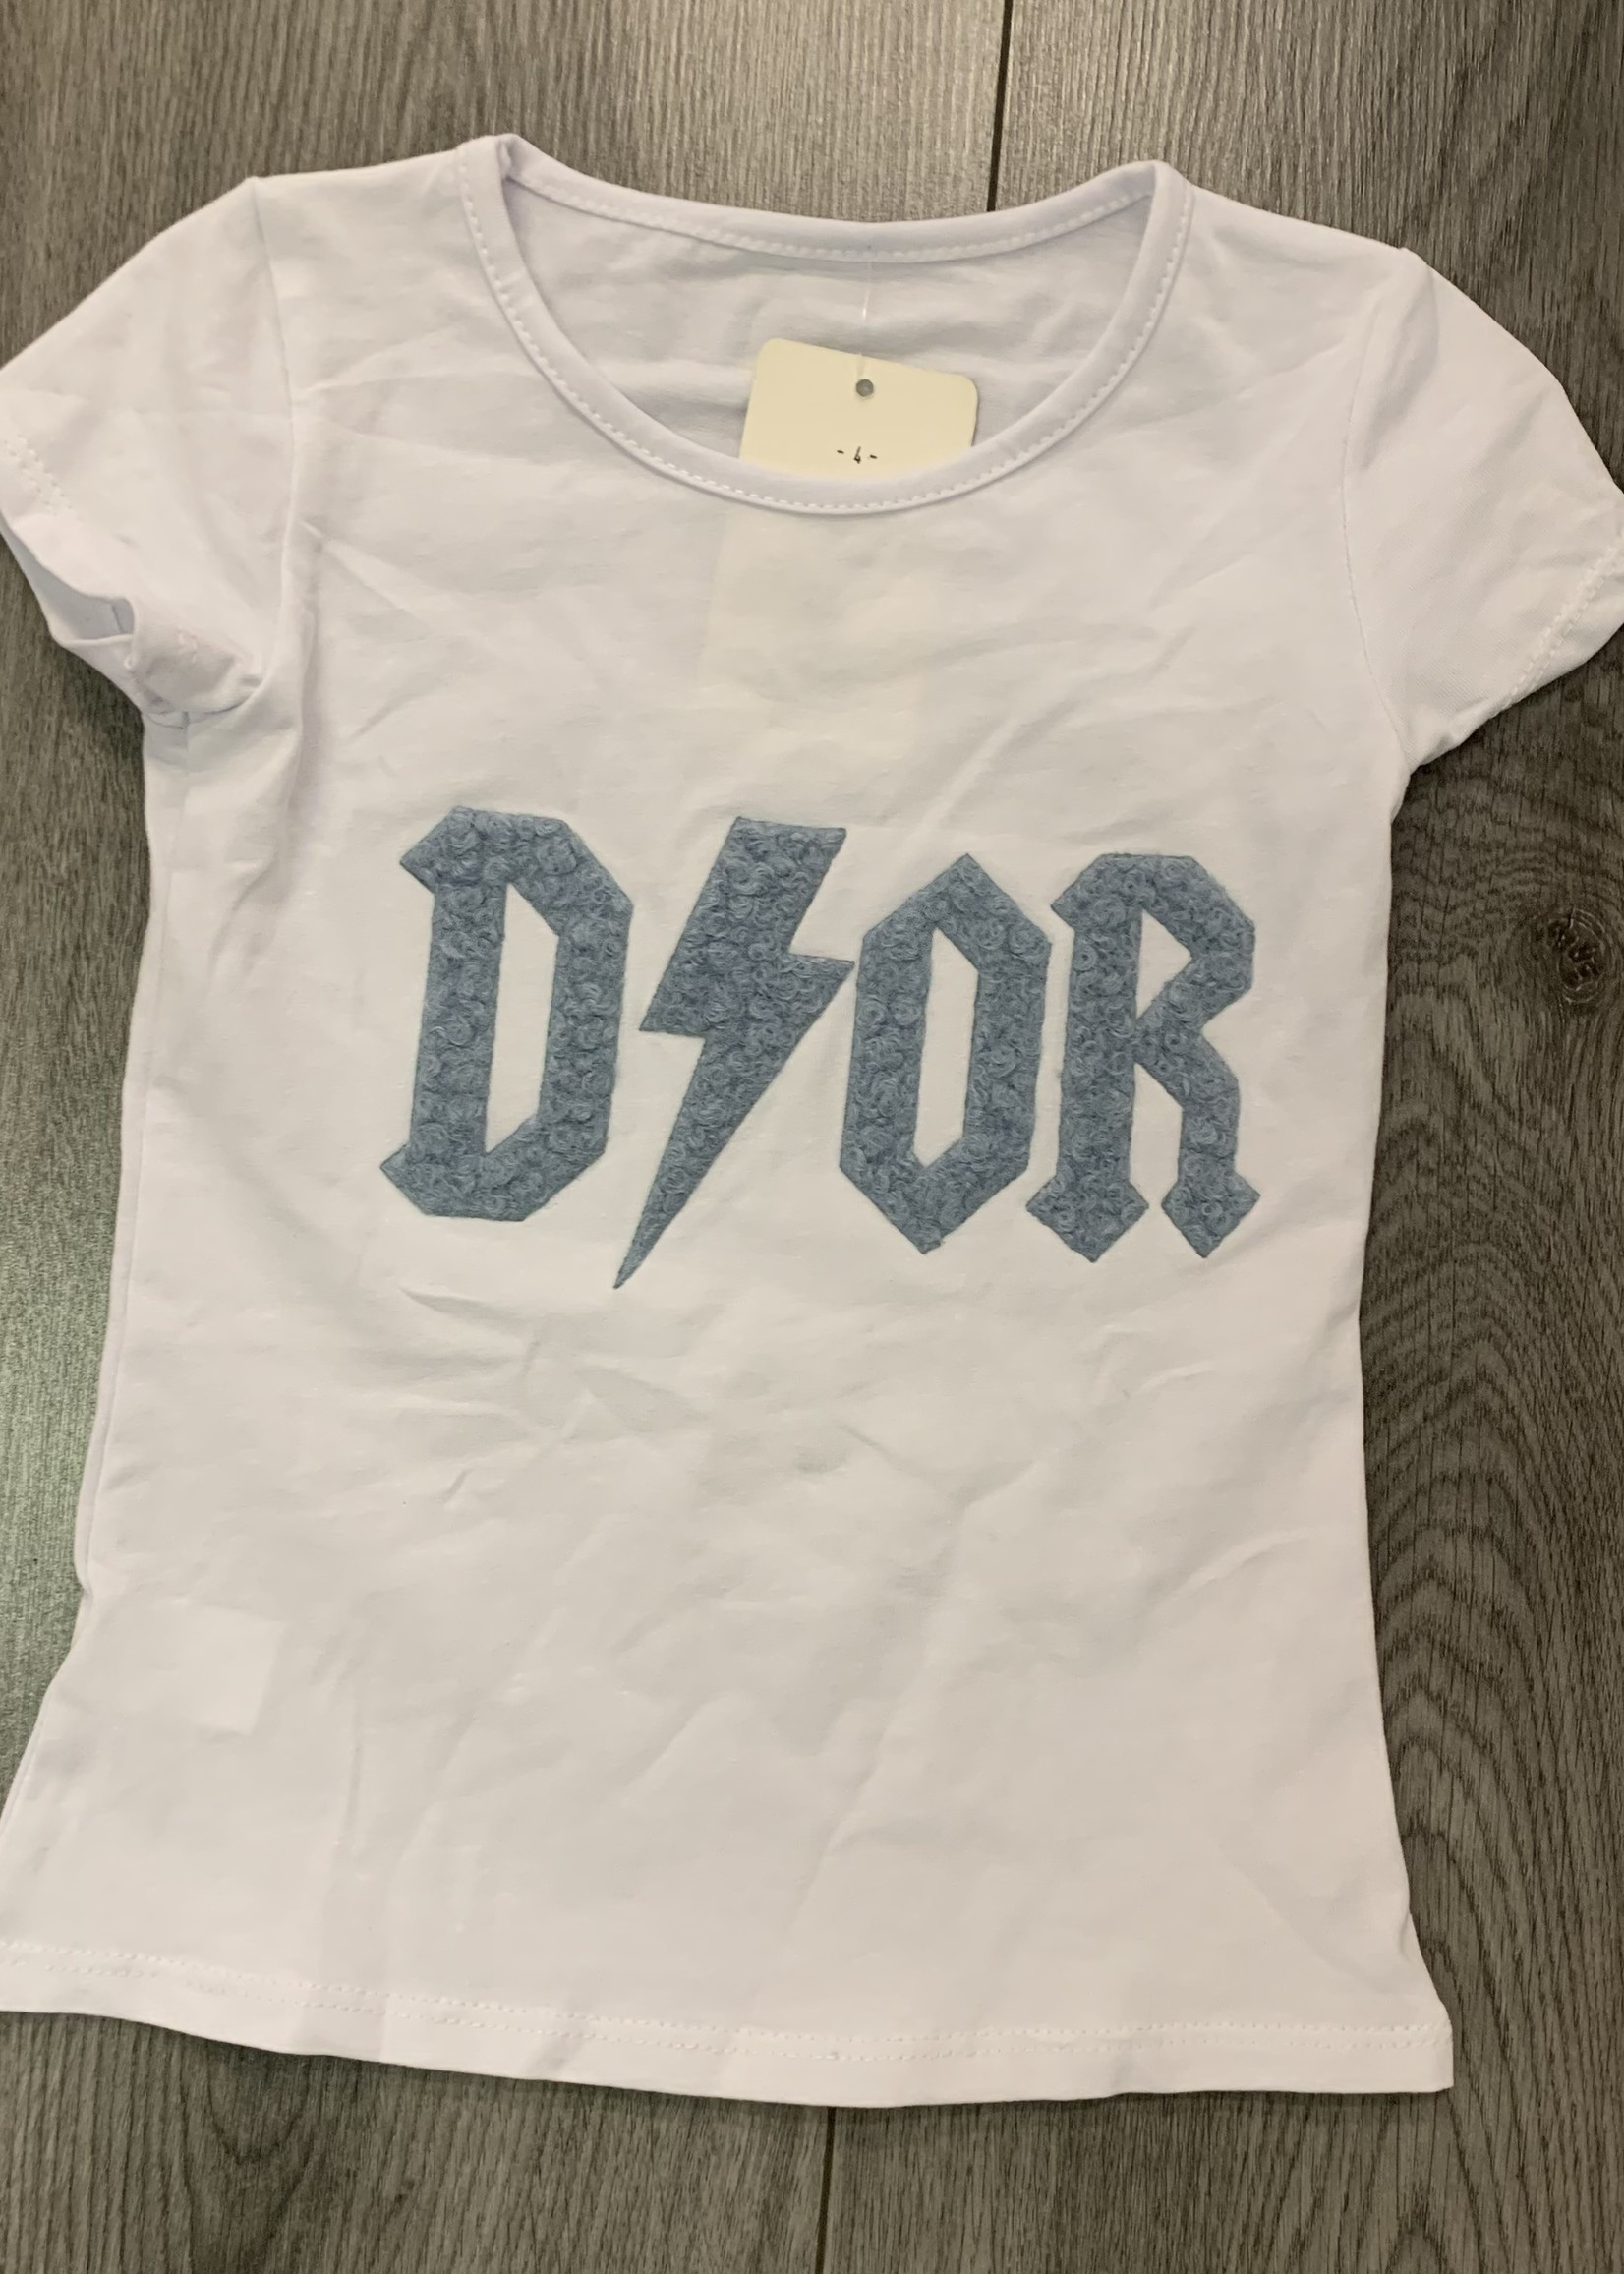 Divanis Divanis dior tshirt blauwe letters